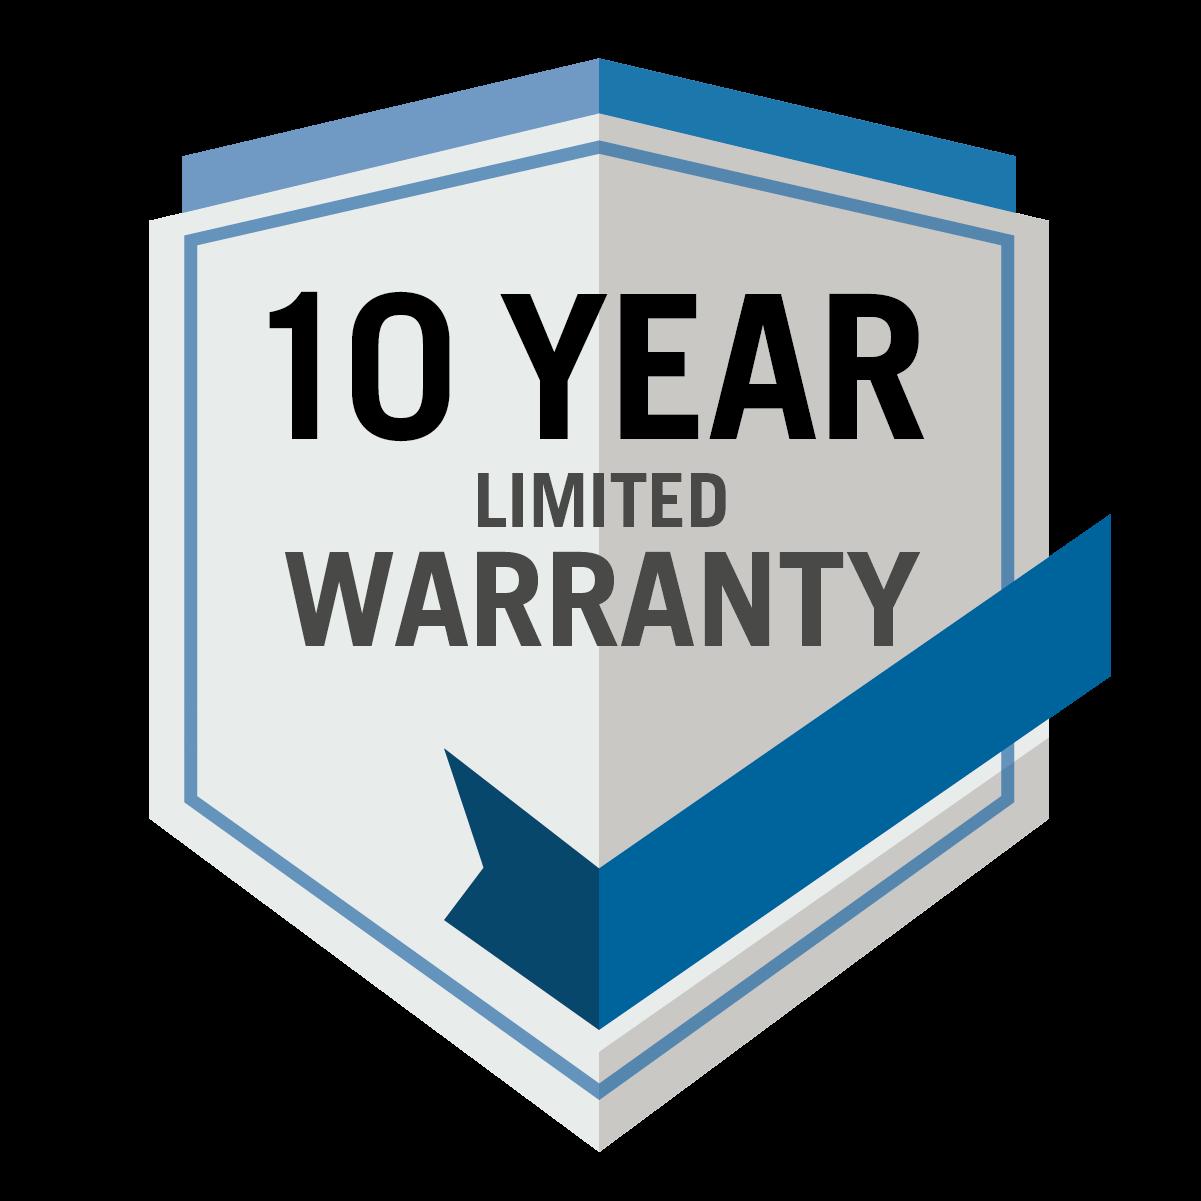 https://assets.koempf24.de/NAPO_10_year_limited_warranty.png?auto=format&fit=max&h=800&q=75&w=1110